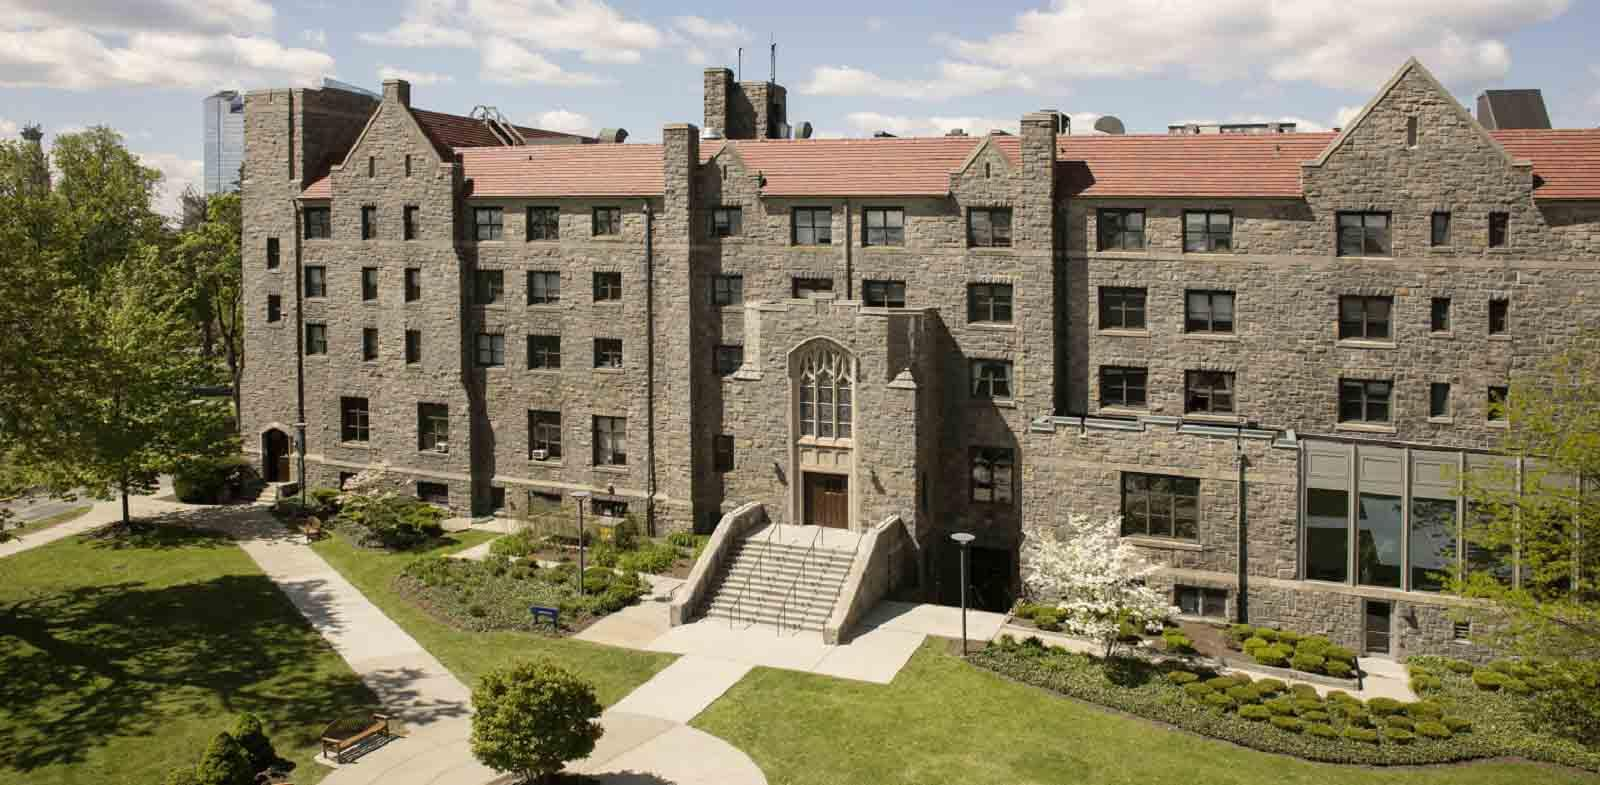 Preston Hall, Elisabeth Haub School of Law